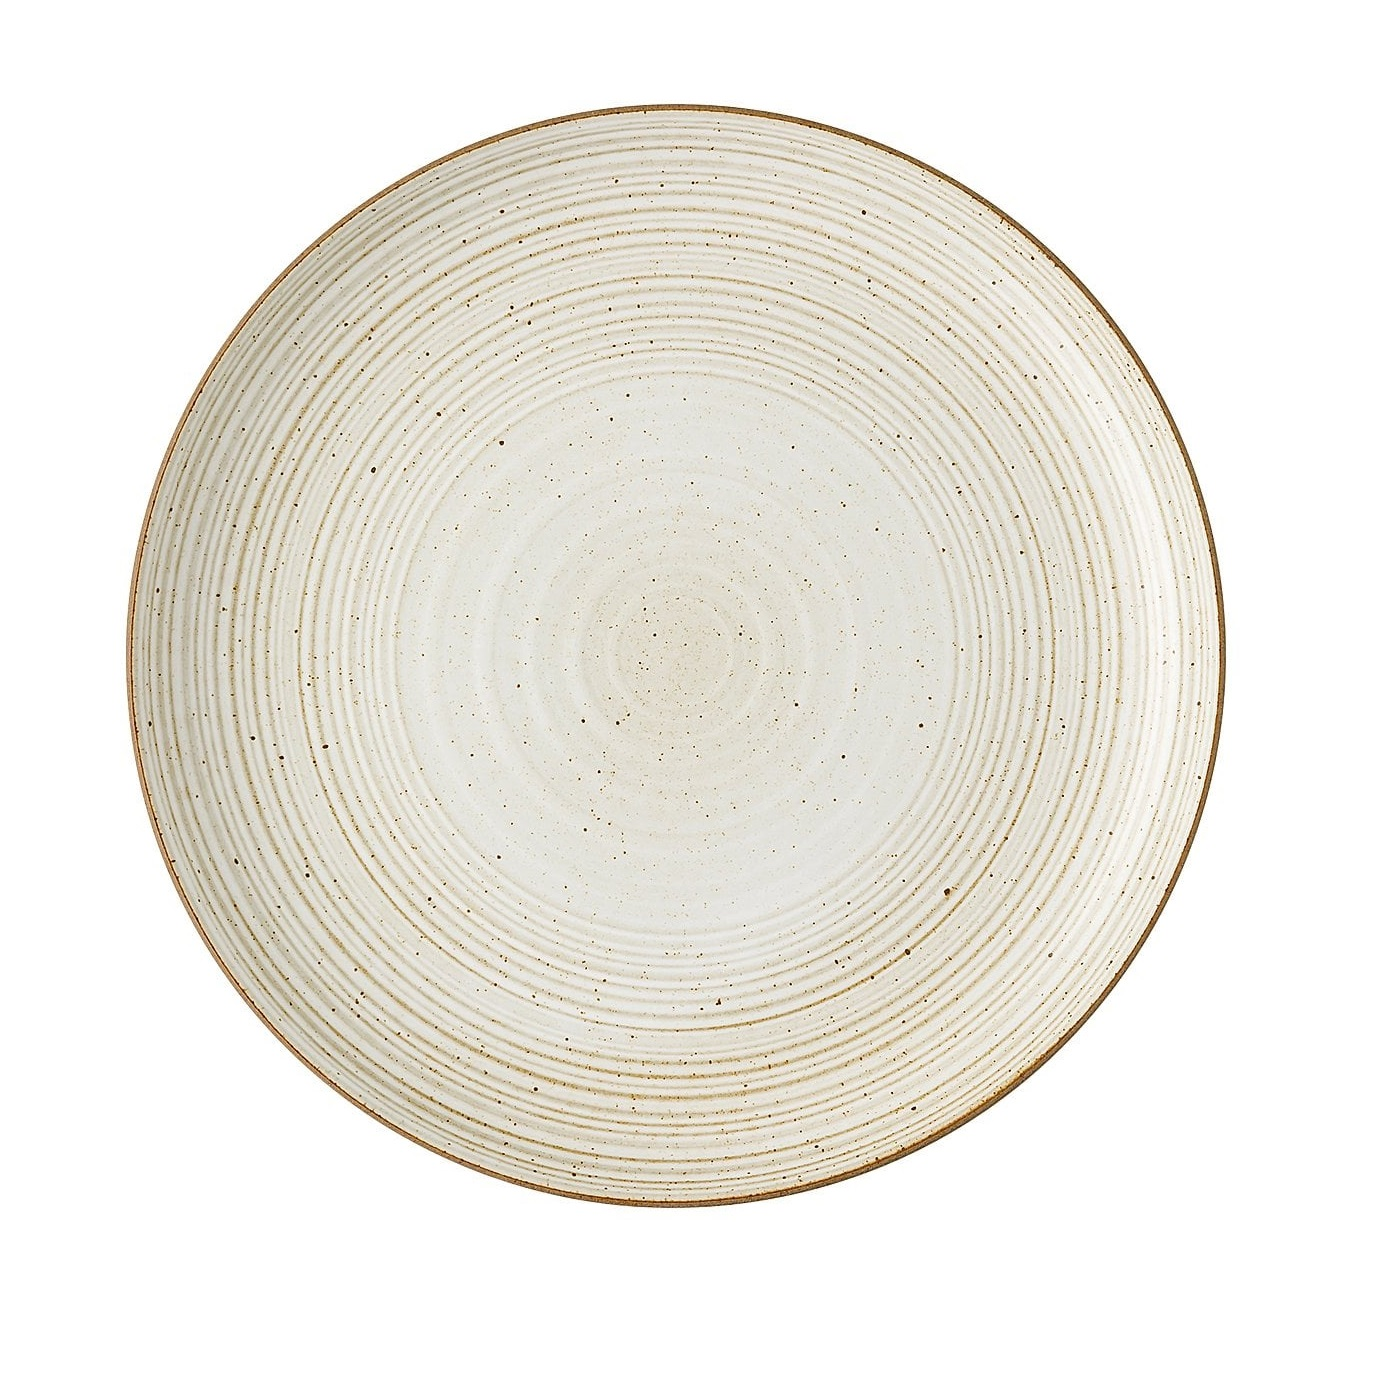 Онлайн каталог PROMENU: Тарелка обеденная керамическая Thomas Nature, диаметр 27 см, белый                               21730-227070-60227